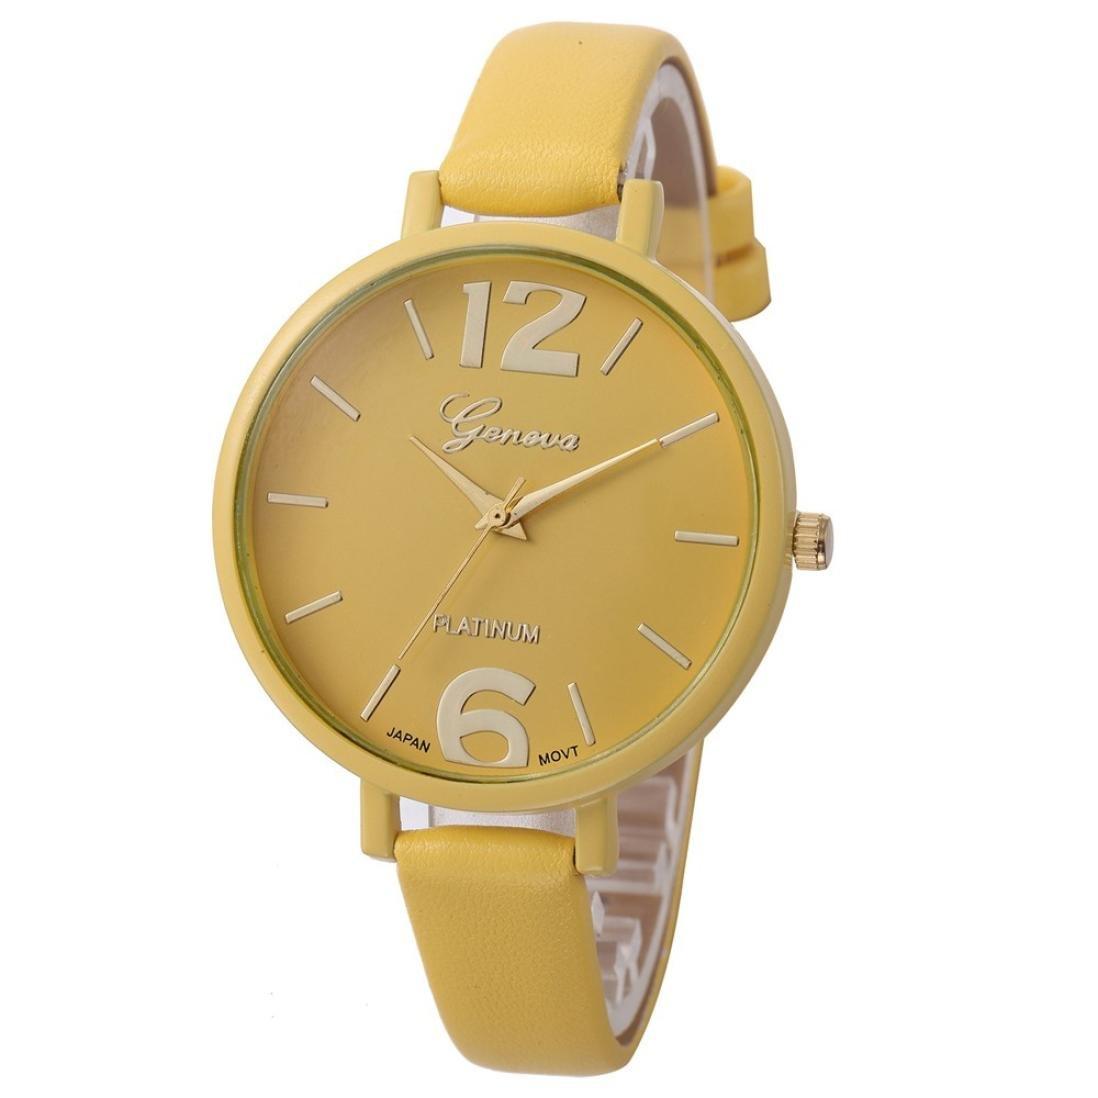 SMTSMT Women's Leather Analog Quartz Wrist Watch-Yellow